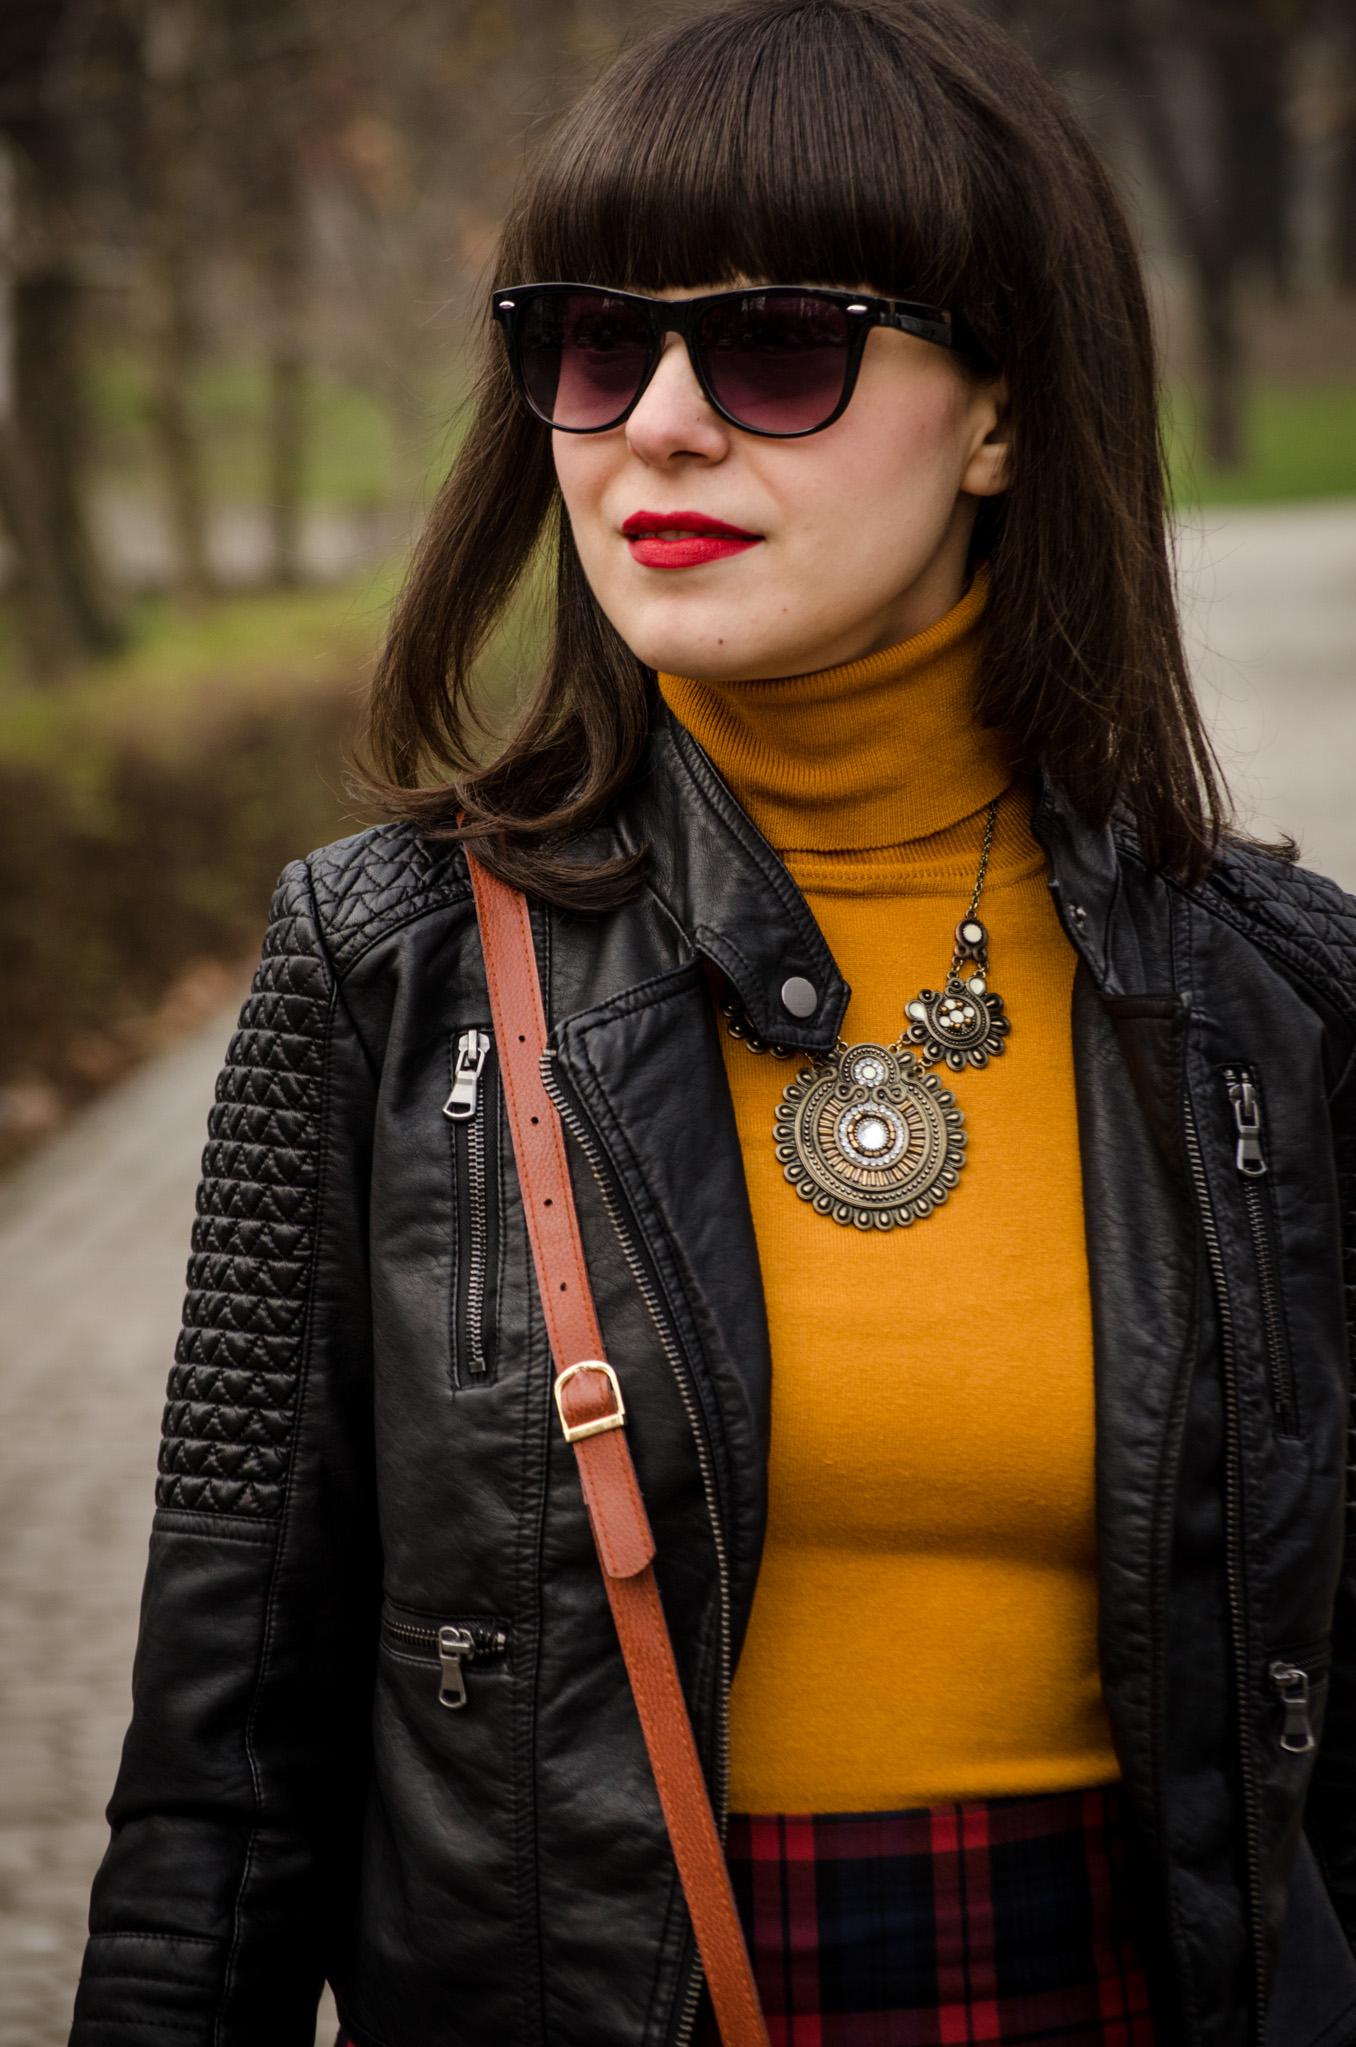 rock leather jacket high waist tartan skirt burnt orange turtleneck mustard high heels fall bangs hair biker look zara new yorker poema